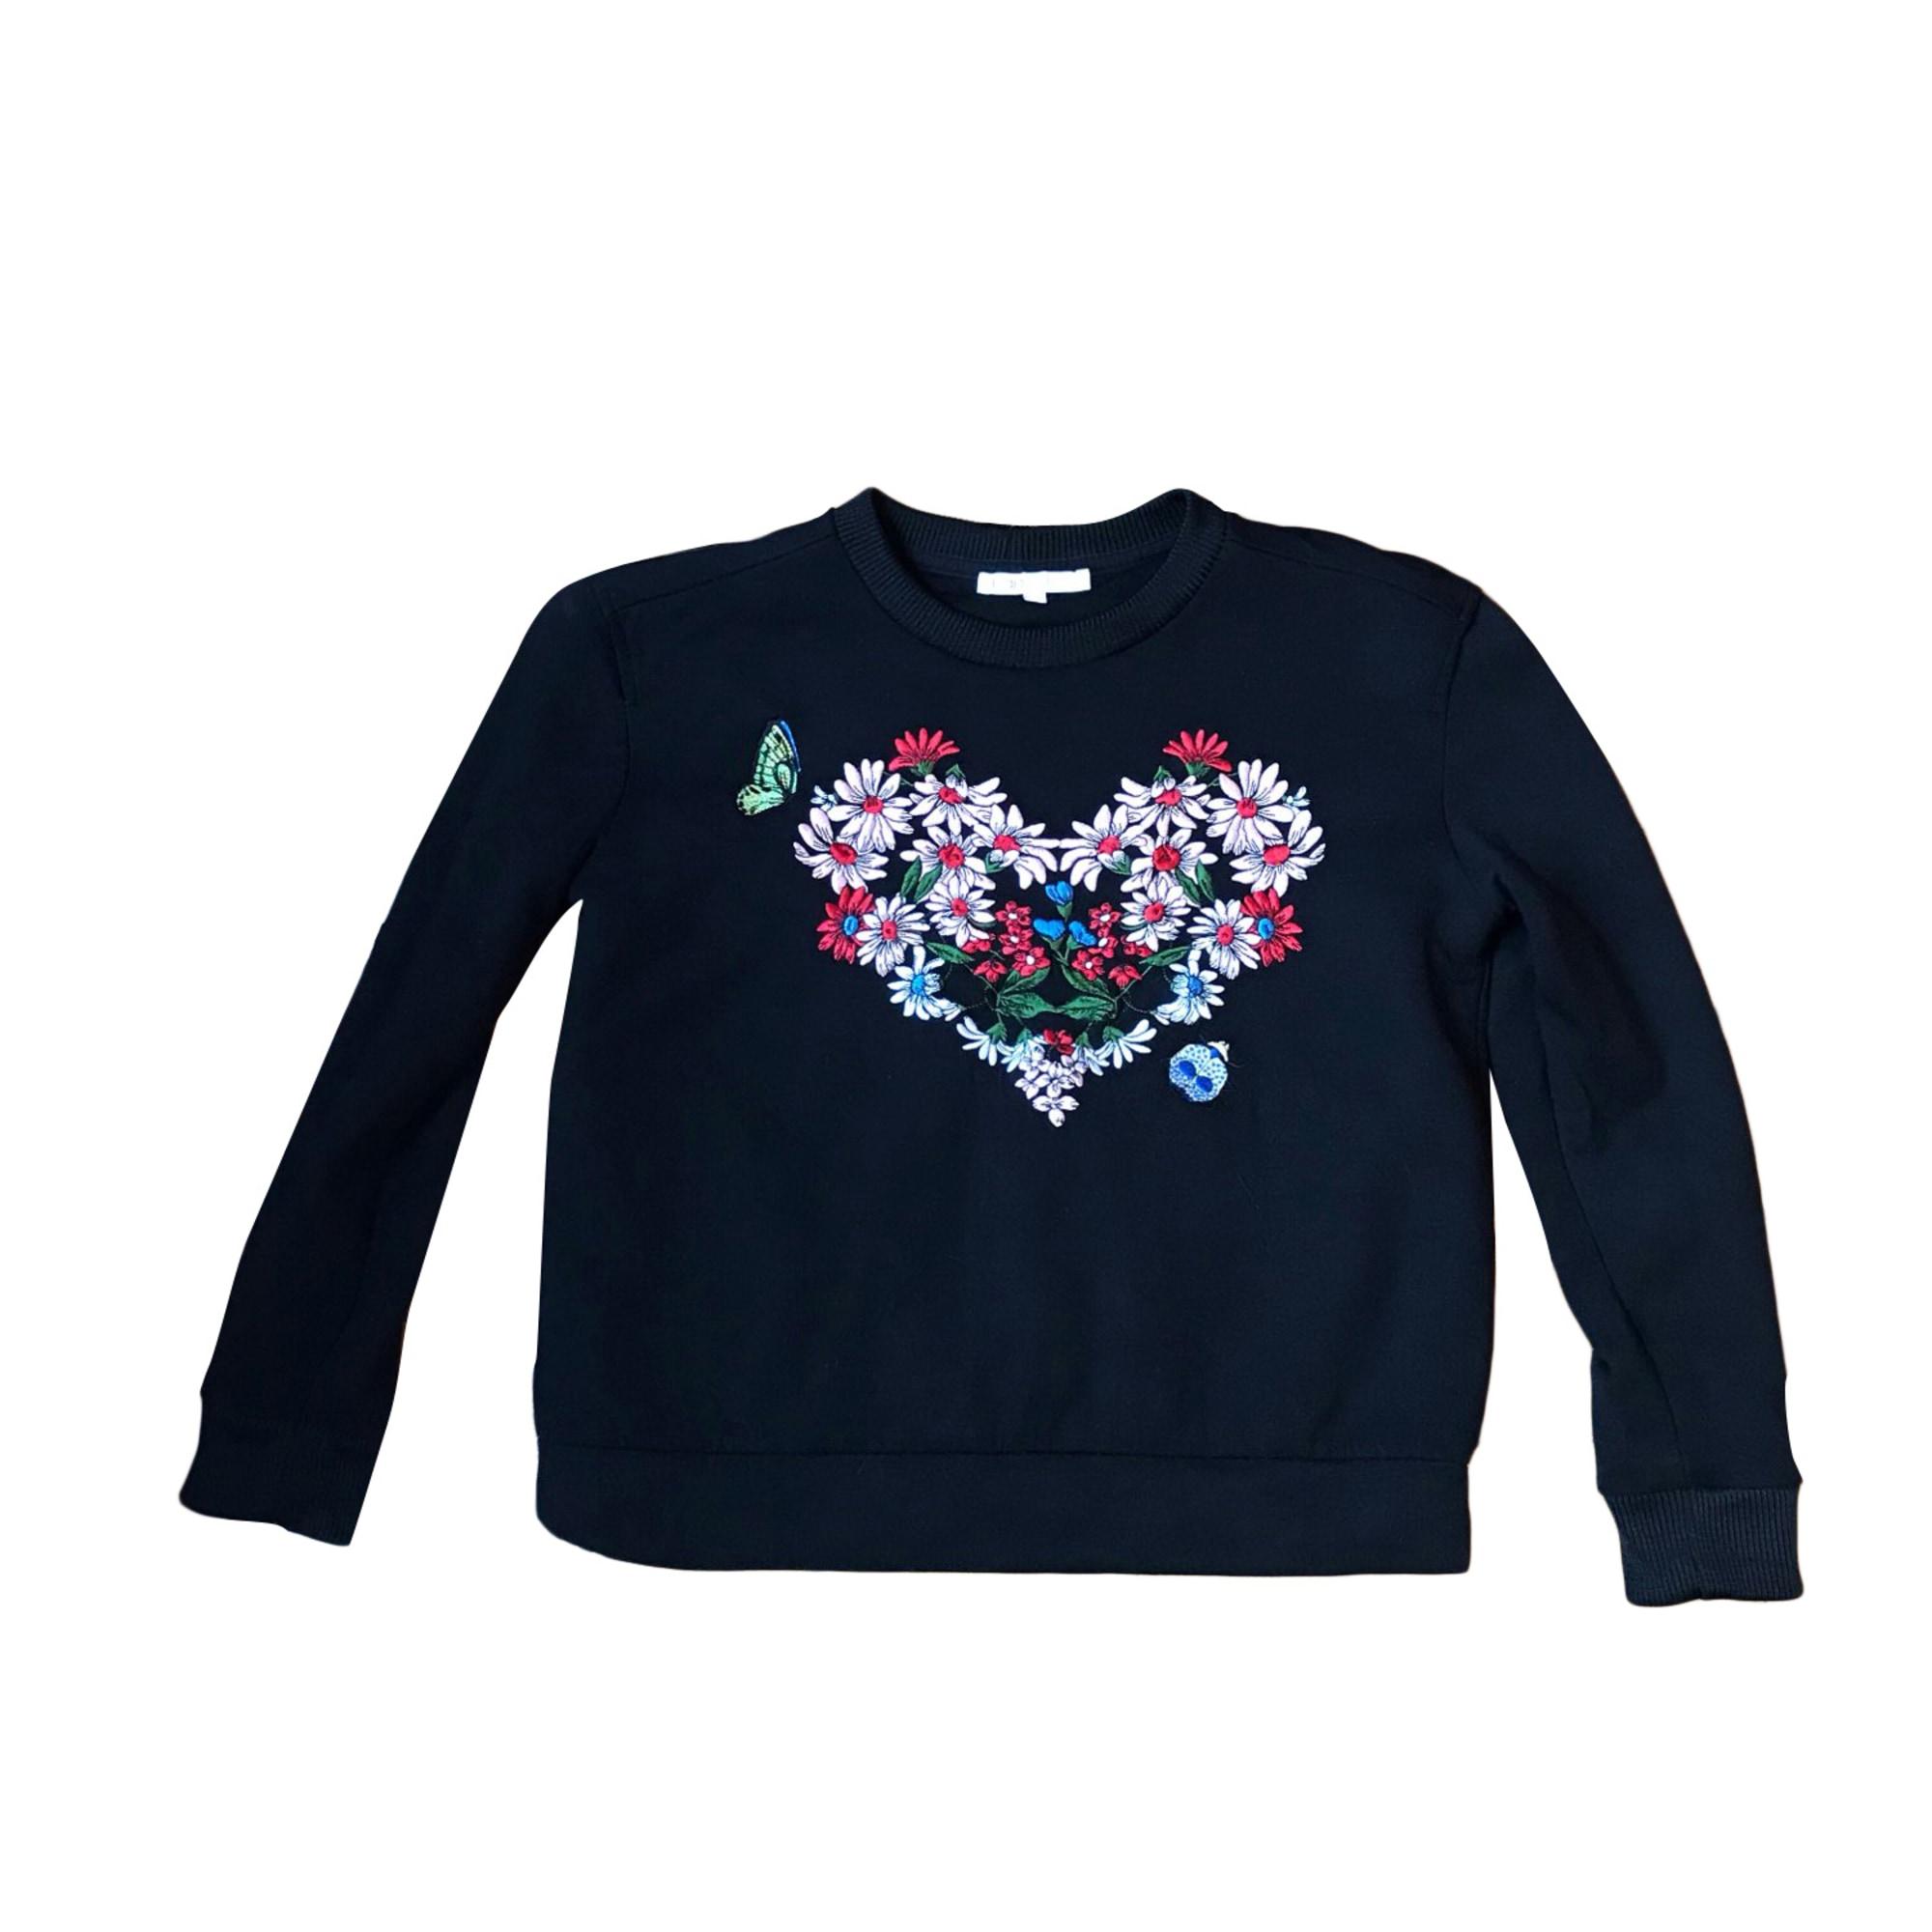 Maje Top, tee-shirt viscose animalier 36 (S, T1)